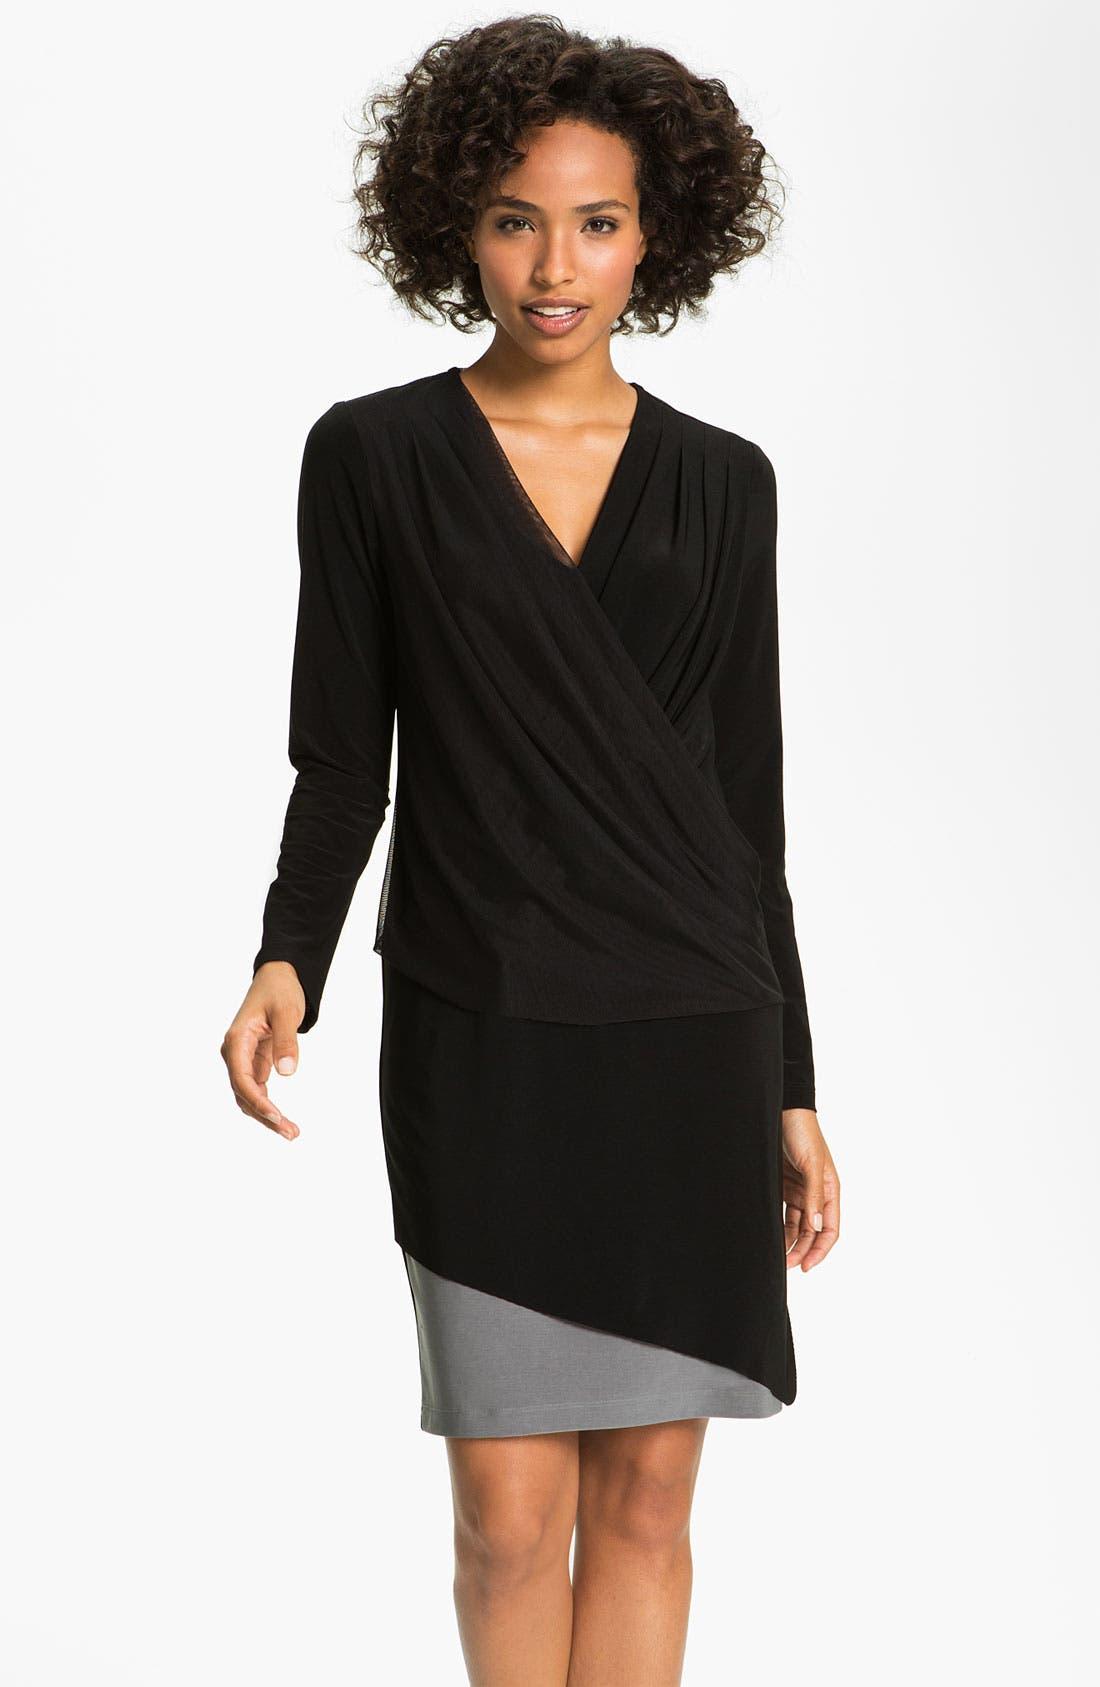 Alternate Image 1 Selected - Alex & Ava Surplice Mesh & Jersey Dress (Petite)